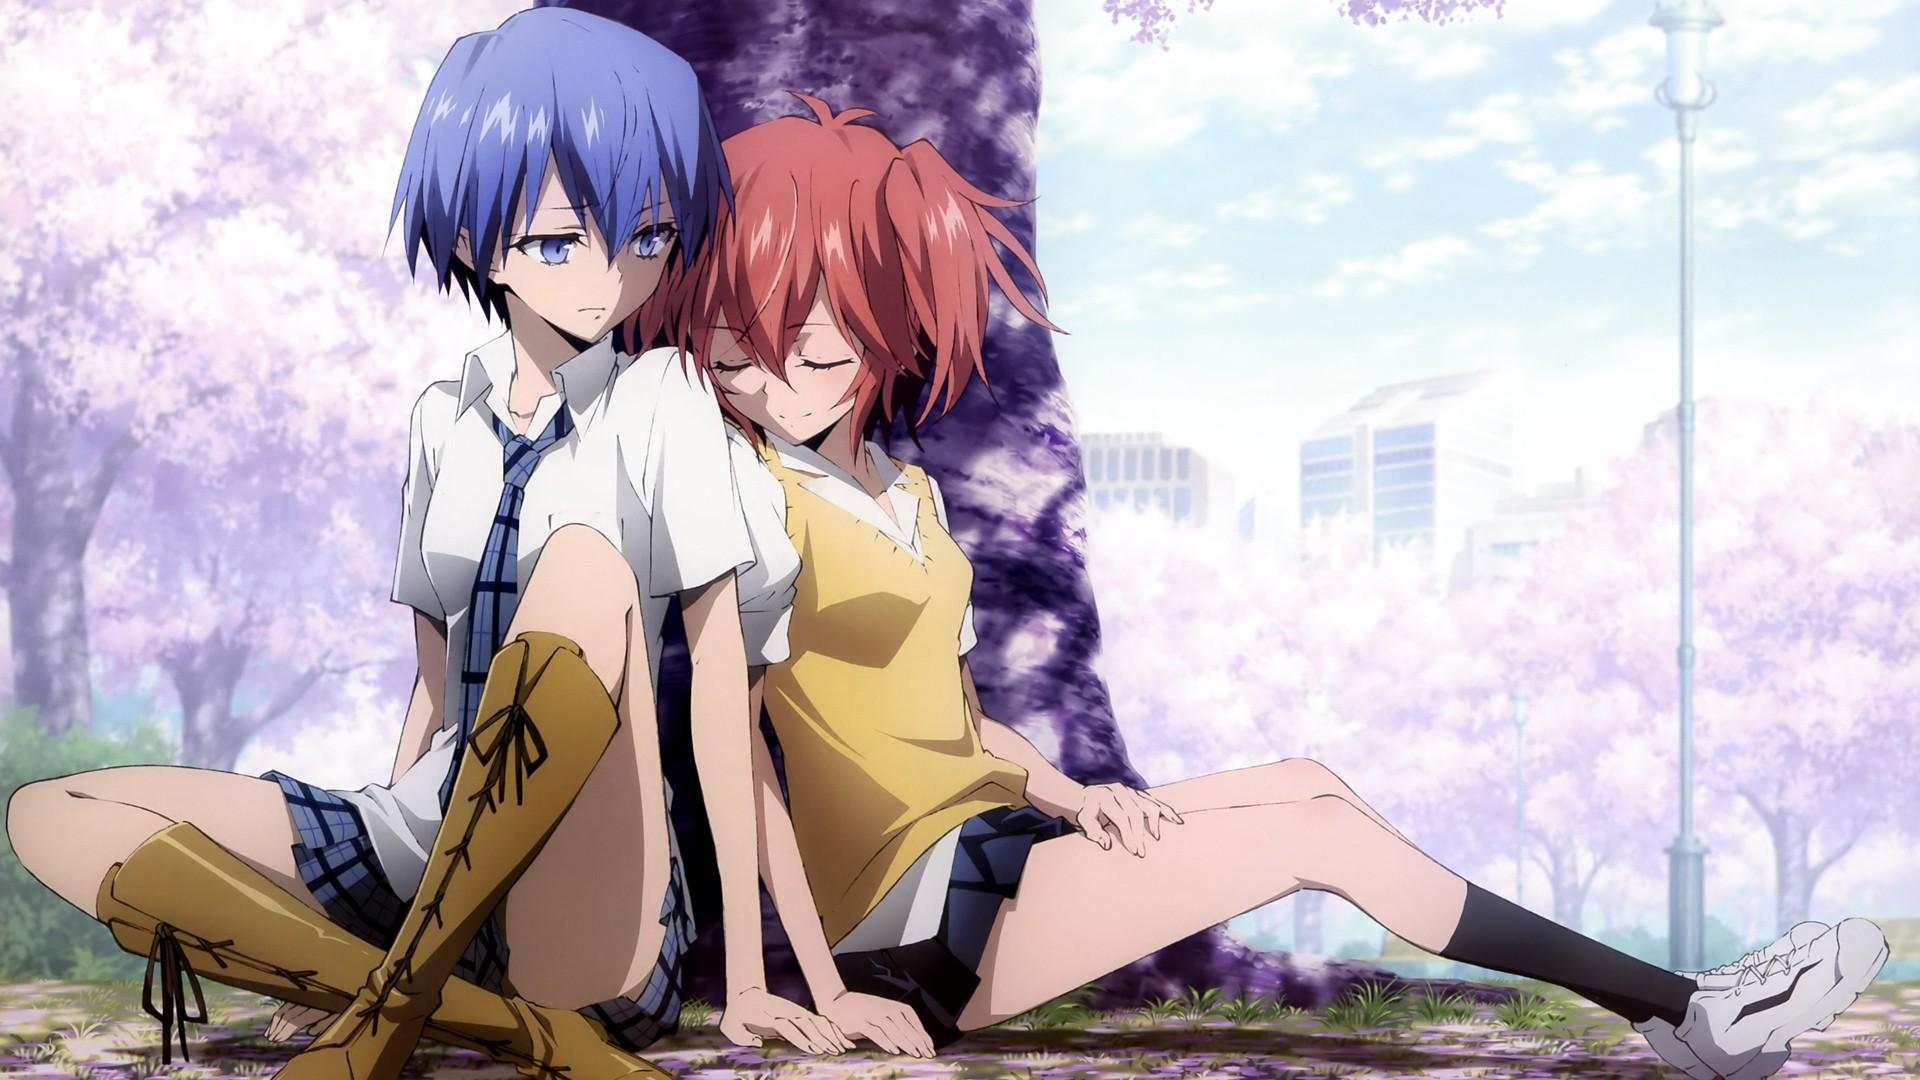 Ichinose Haru, Azuma Tokaku, Anime, Cherry Blossom Trees wallpaper thumb